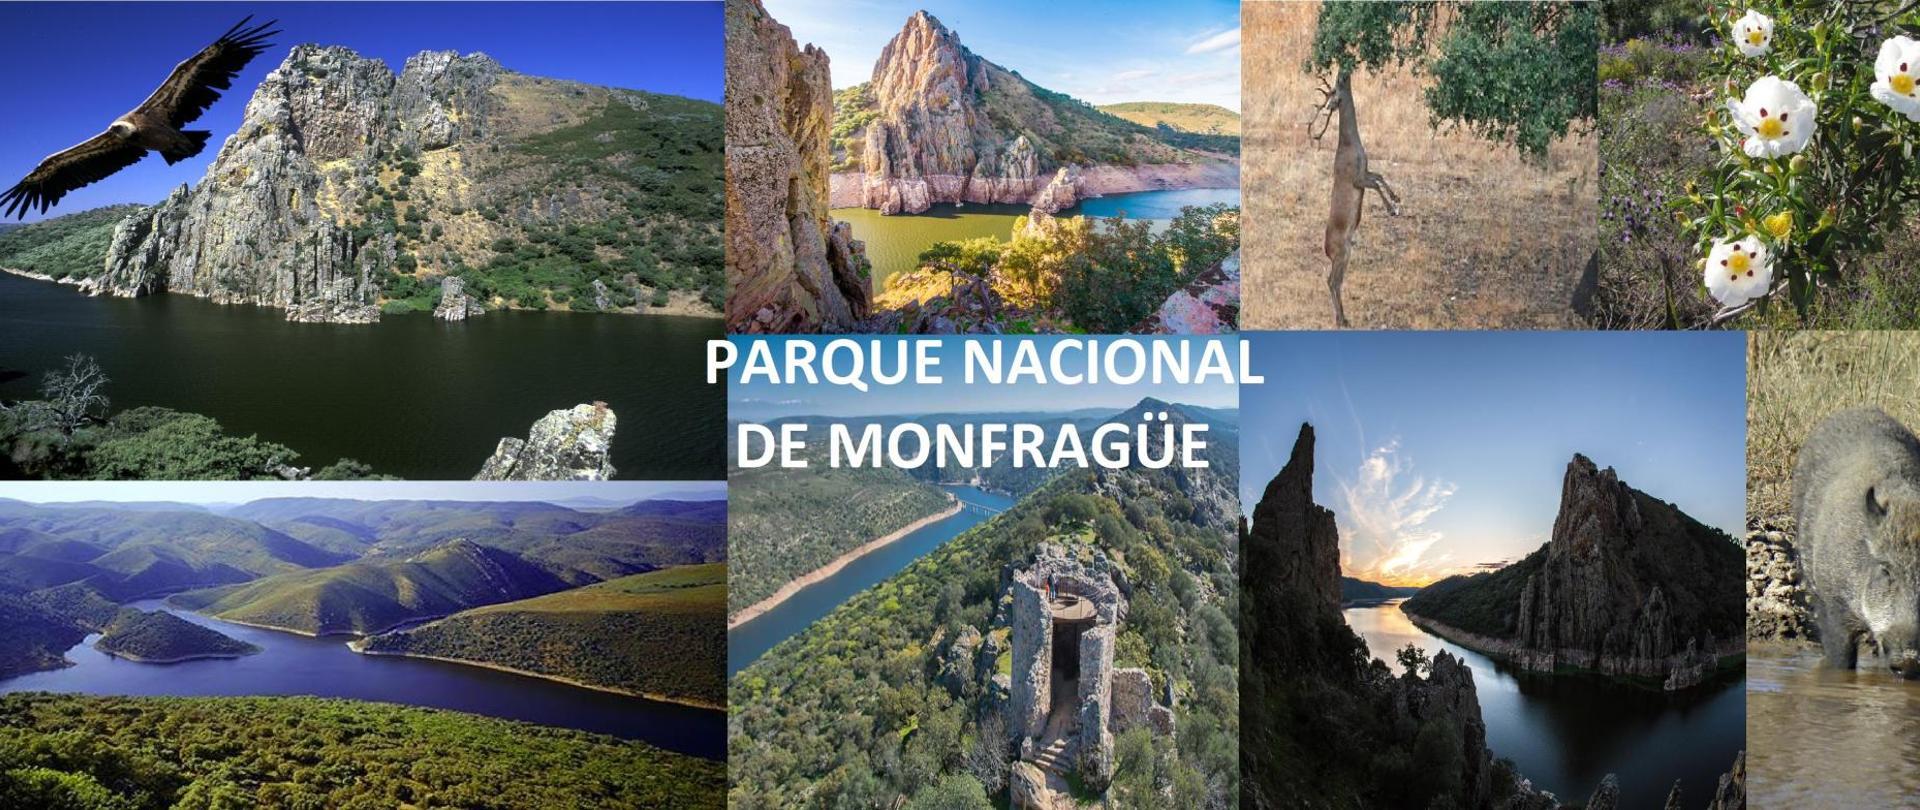 PARQUE NACIONAL DE MONFRAGÜE.jpg